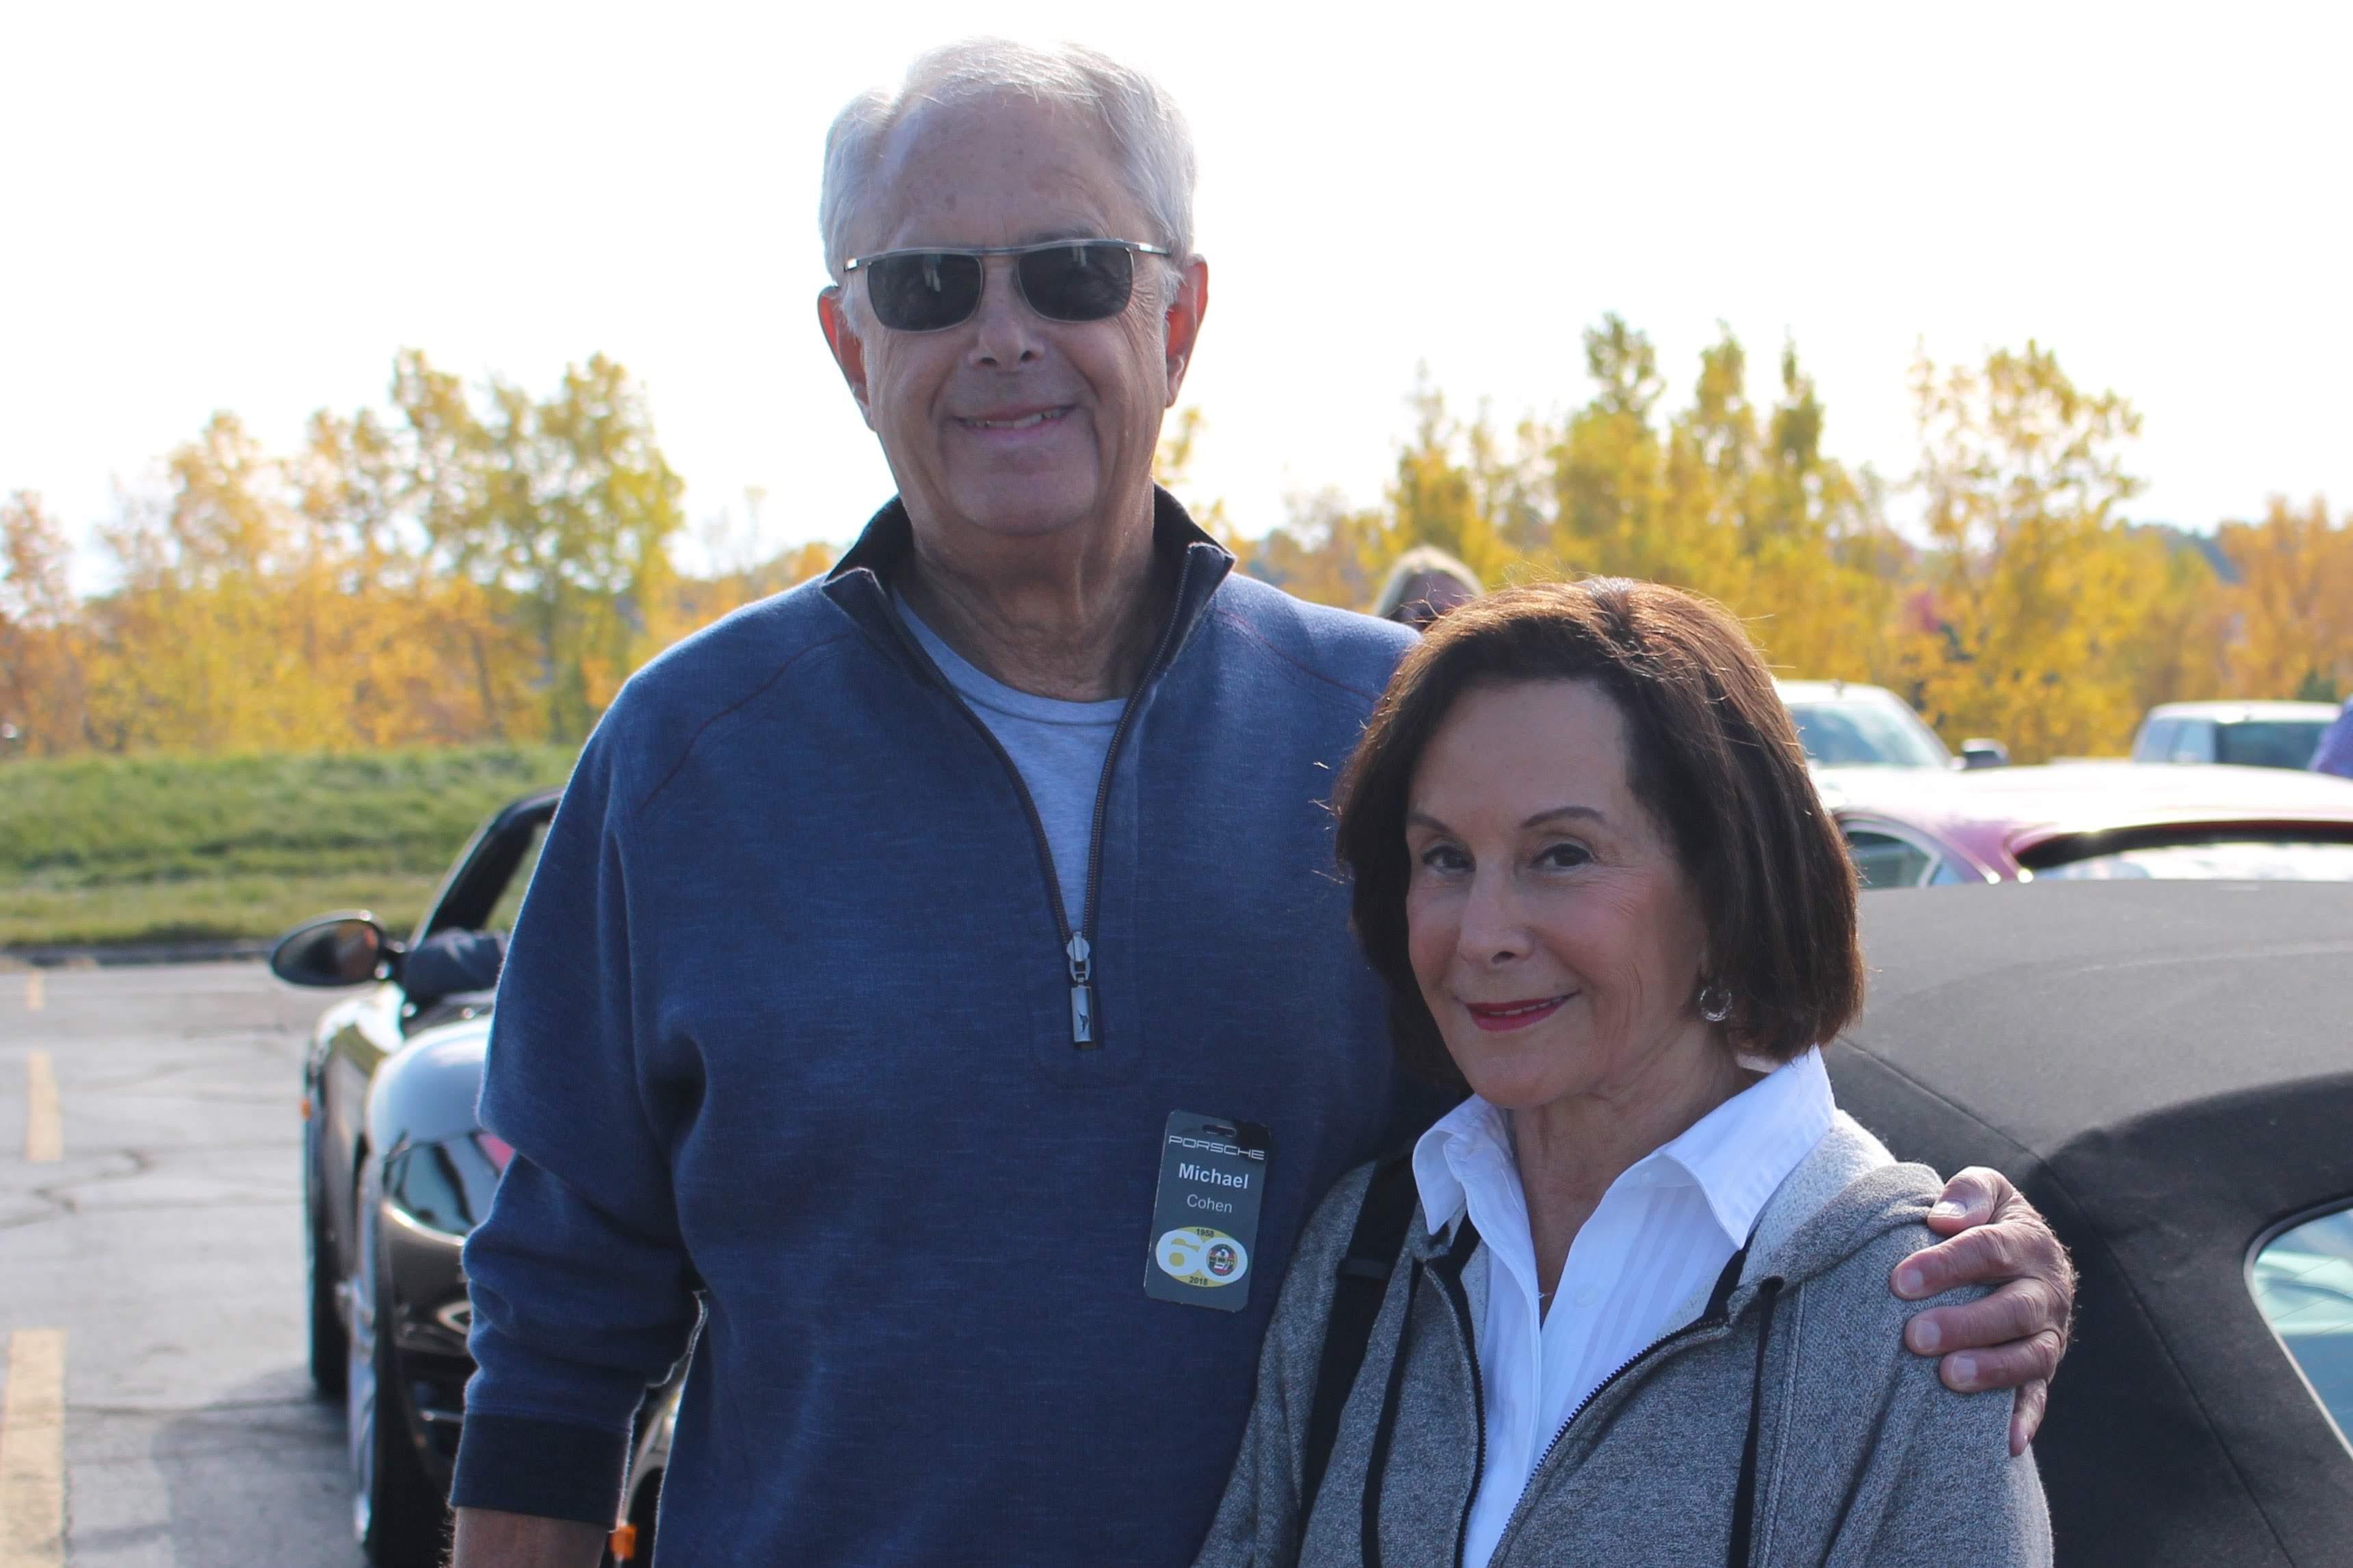 Michael Cohen (SEM/PCA Board Member) and Marlene Thav